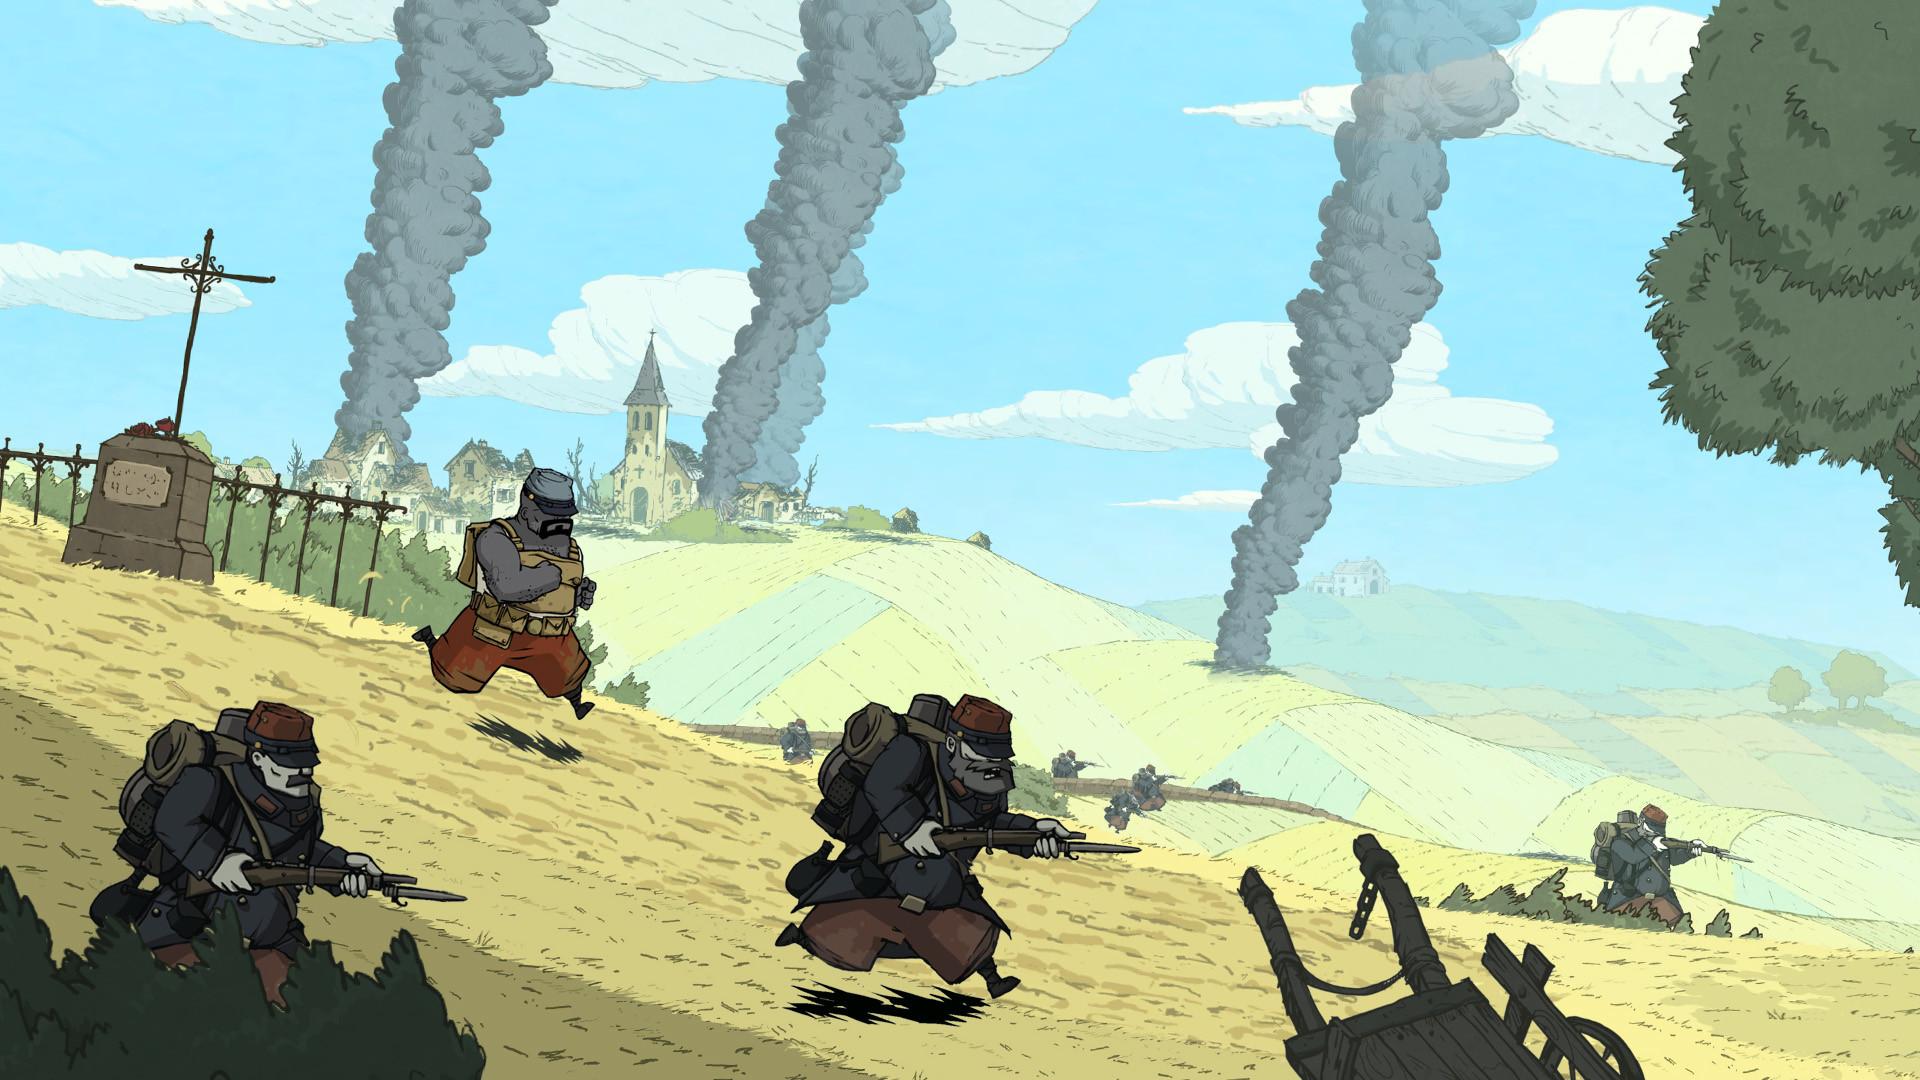 是Steam遊戲特價快訊:《Valiant Hearts: The Great War™ / Soldats Inconnus : Mémoires de la Grande Guerre™》現在特價121元 便宜284元這篇文章的首圖